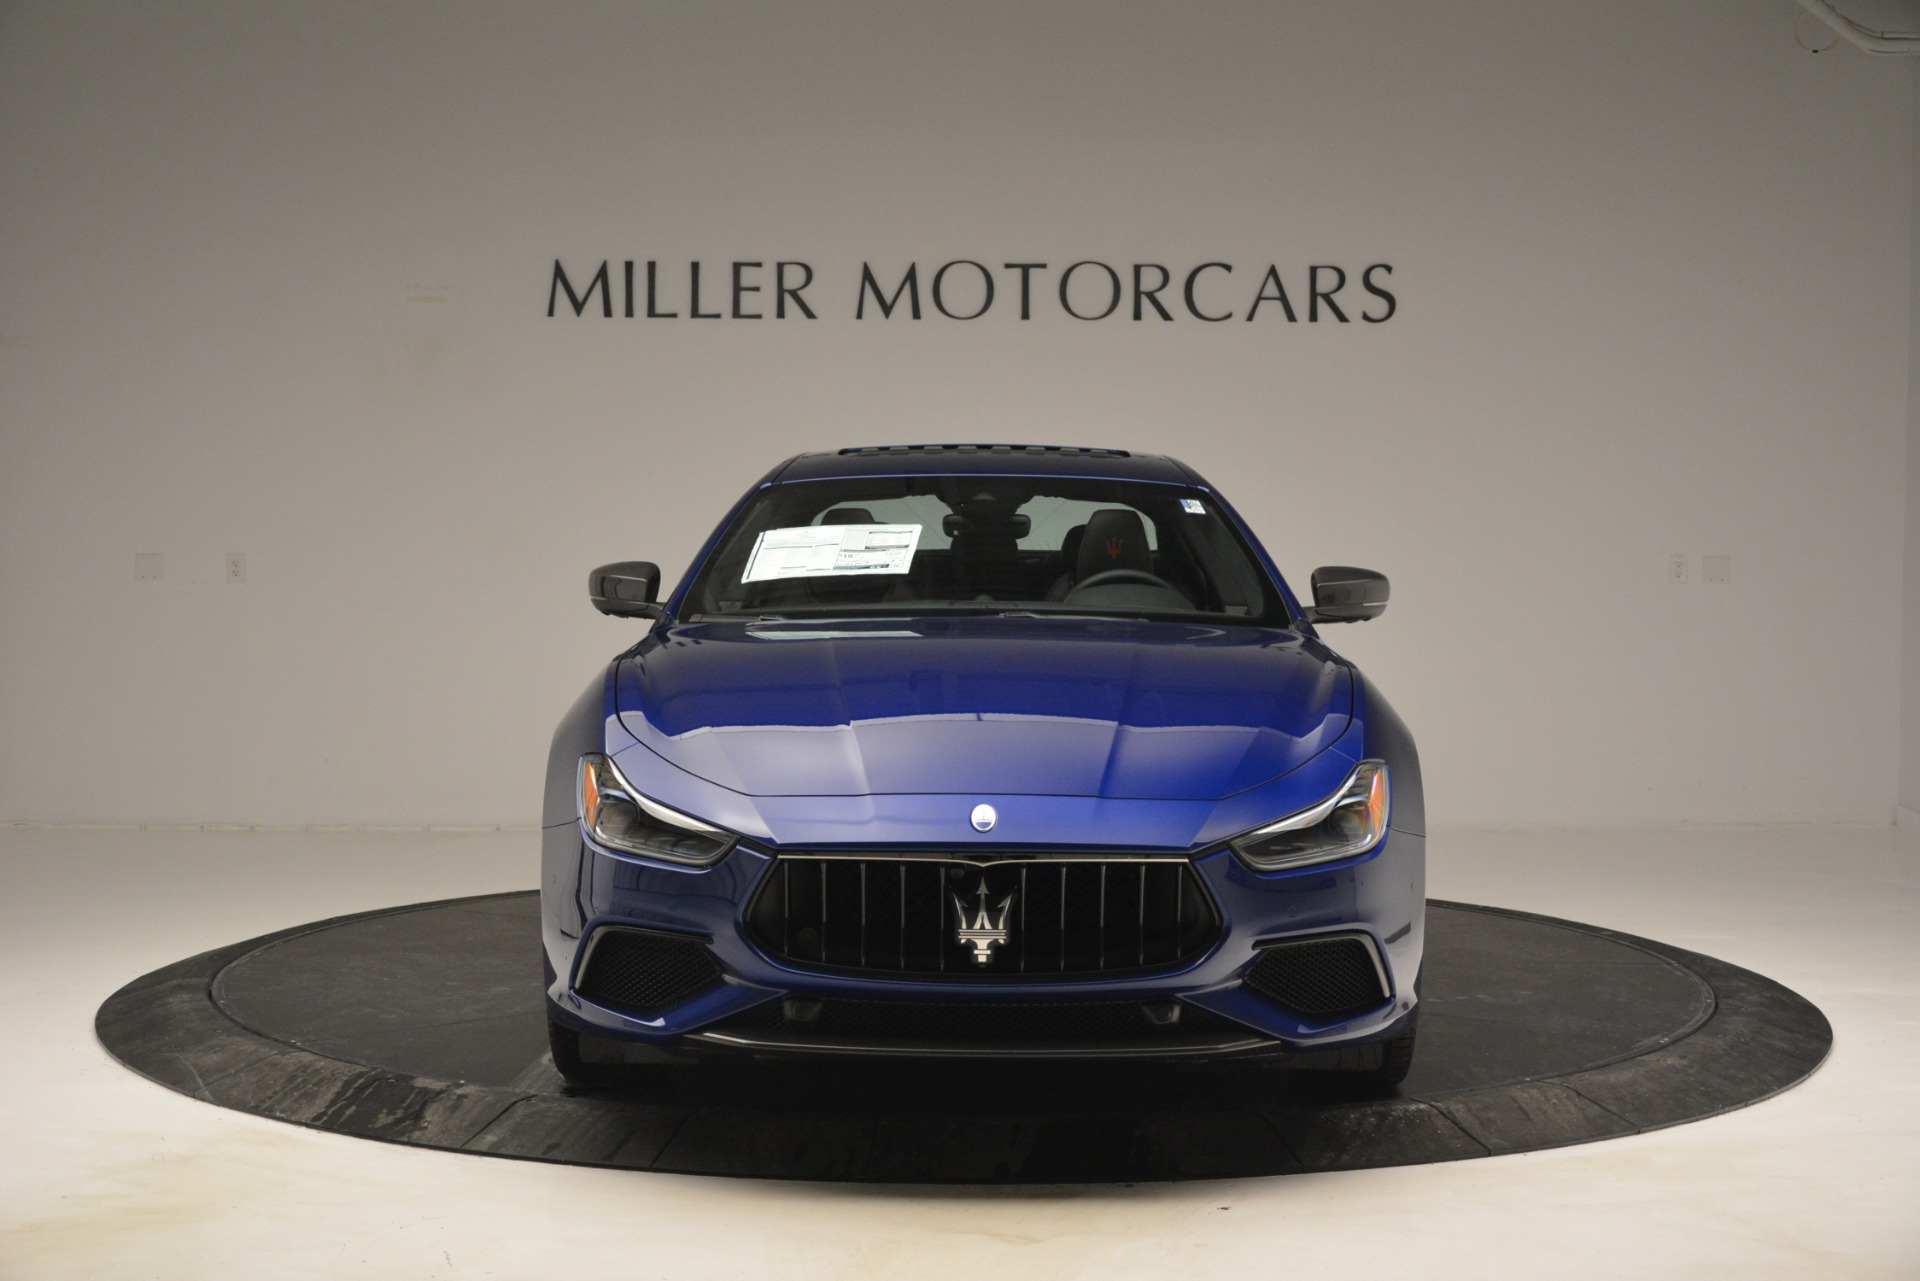 New 2019 Maserati Ghibli S Q4 GranSport For Sale In Westport, CT 2928_p12